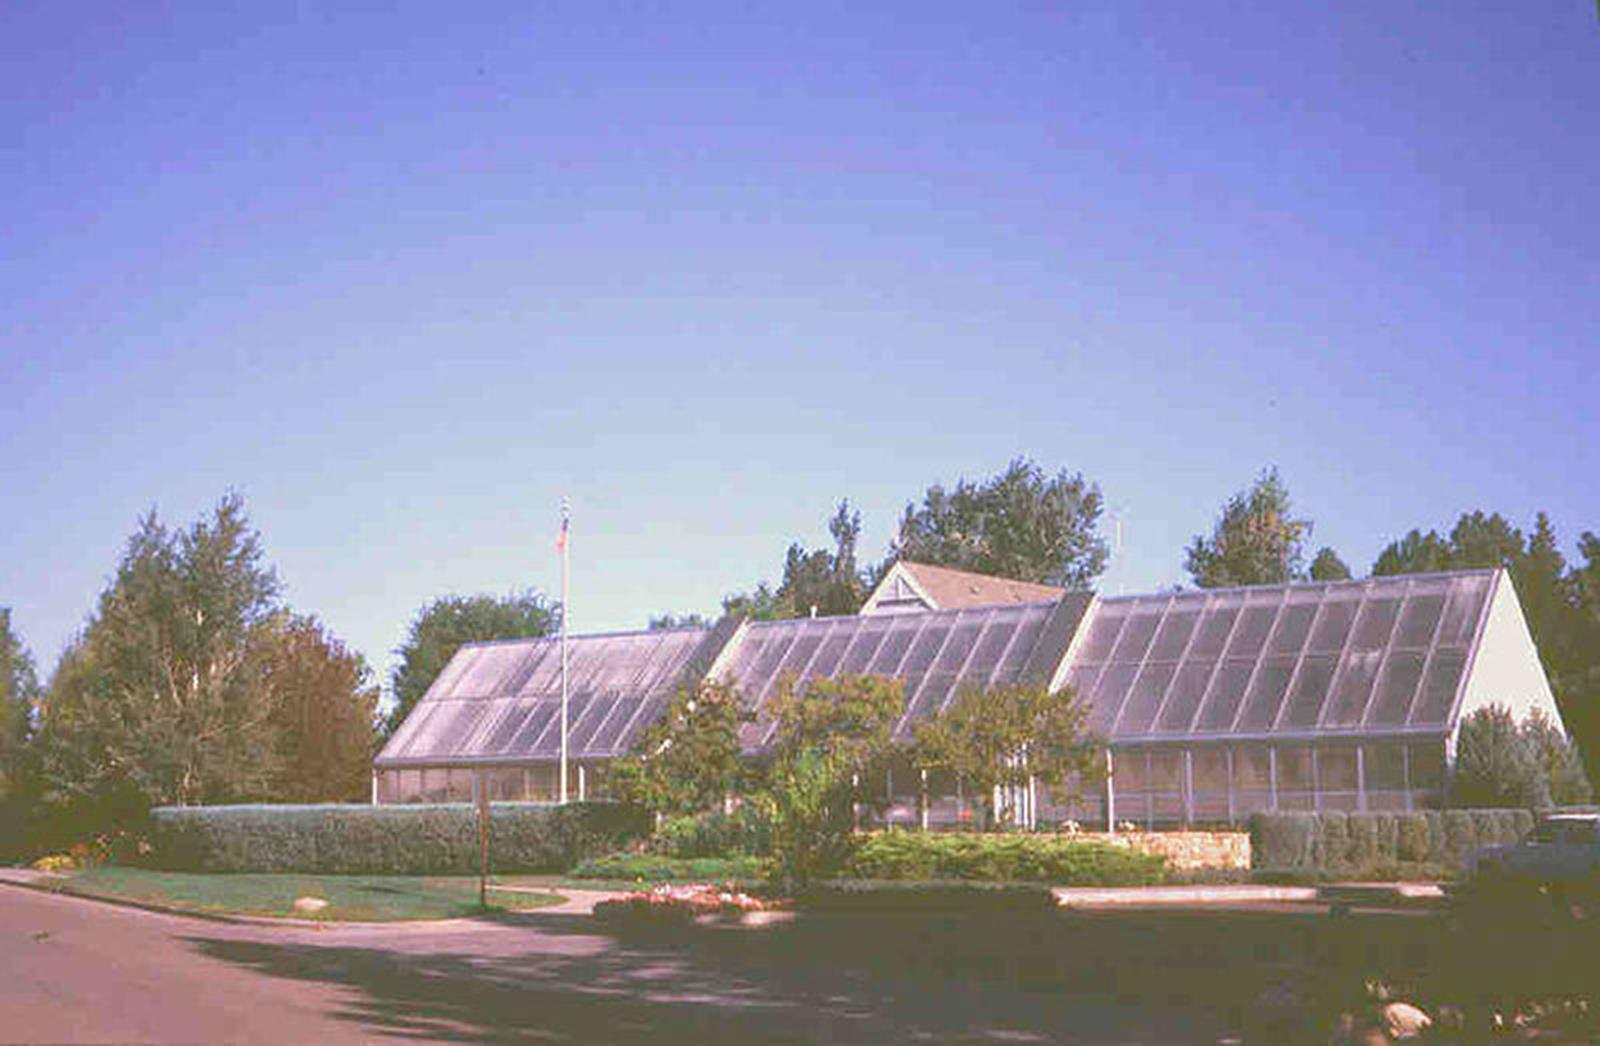 Cheyenne Botanical Gardens